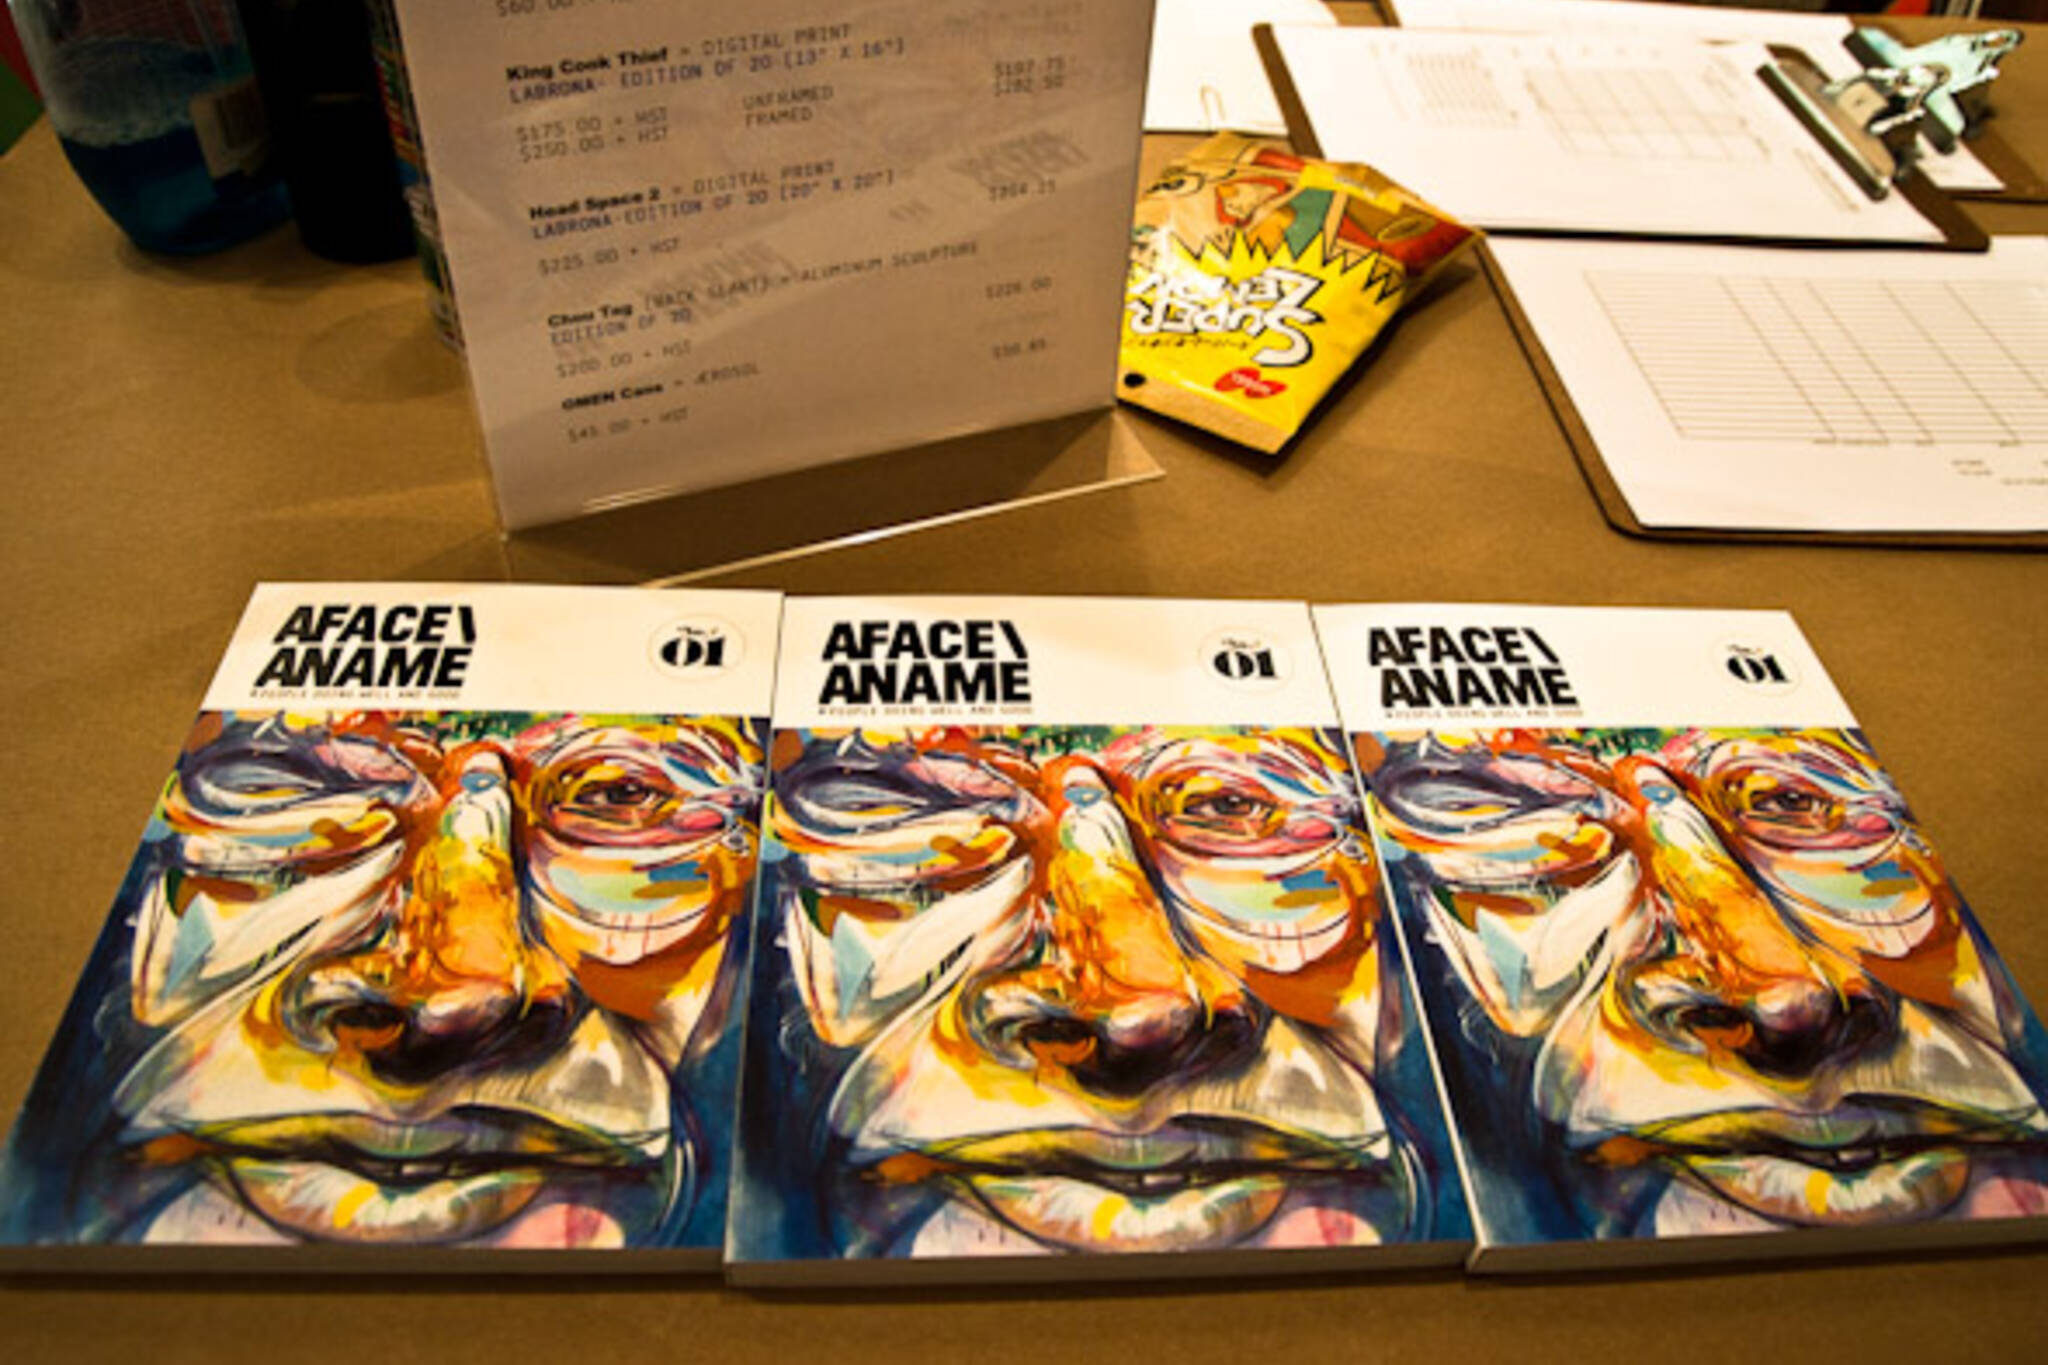 A Face a Name book launch